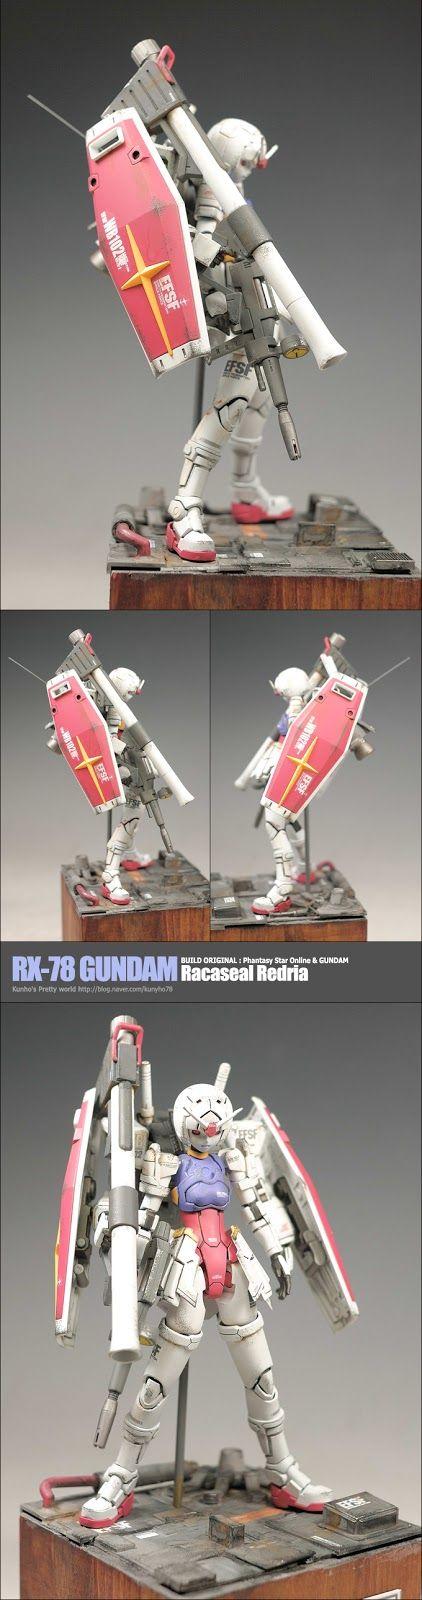 RX-78 Gundam Racaseal Redria - Custom Build     Modeled by Kunho